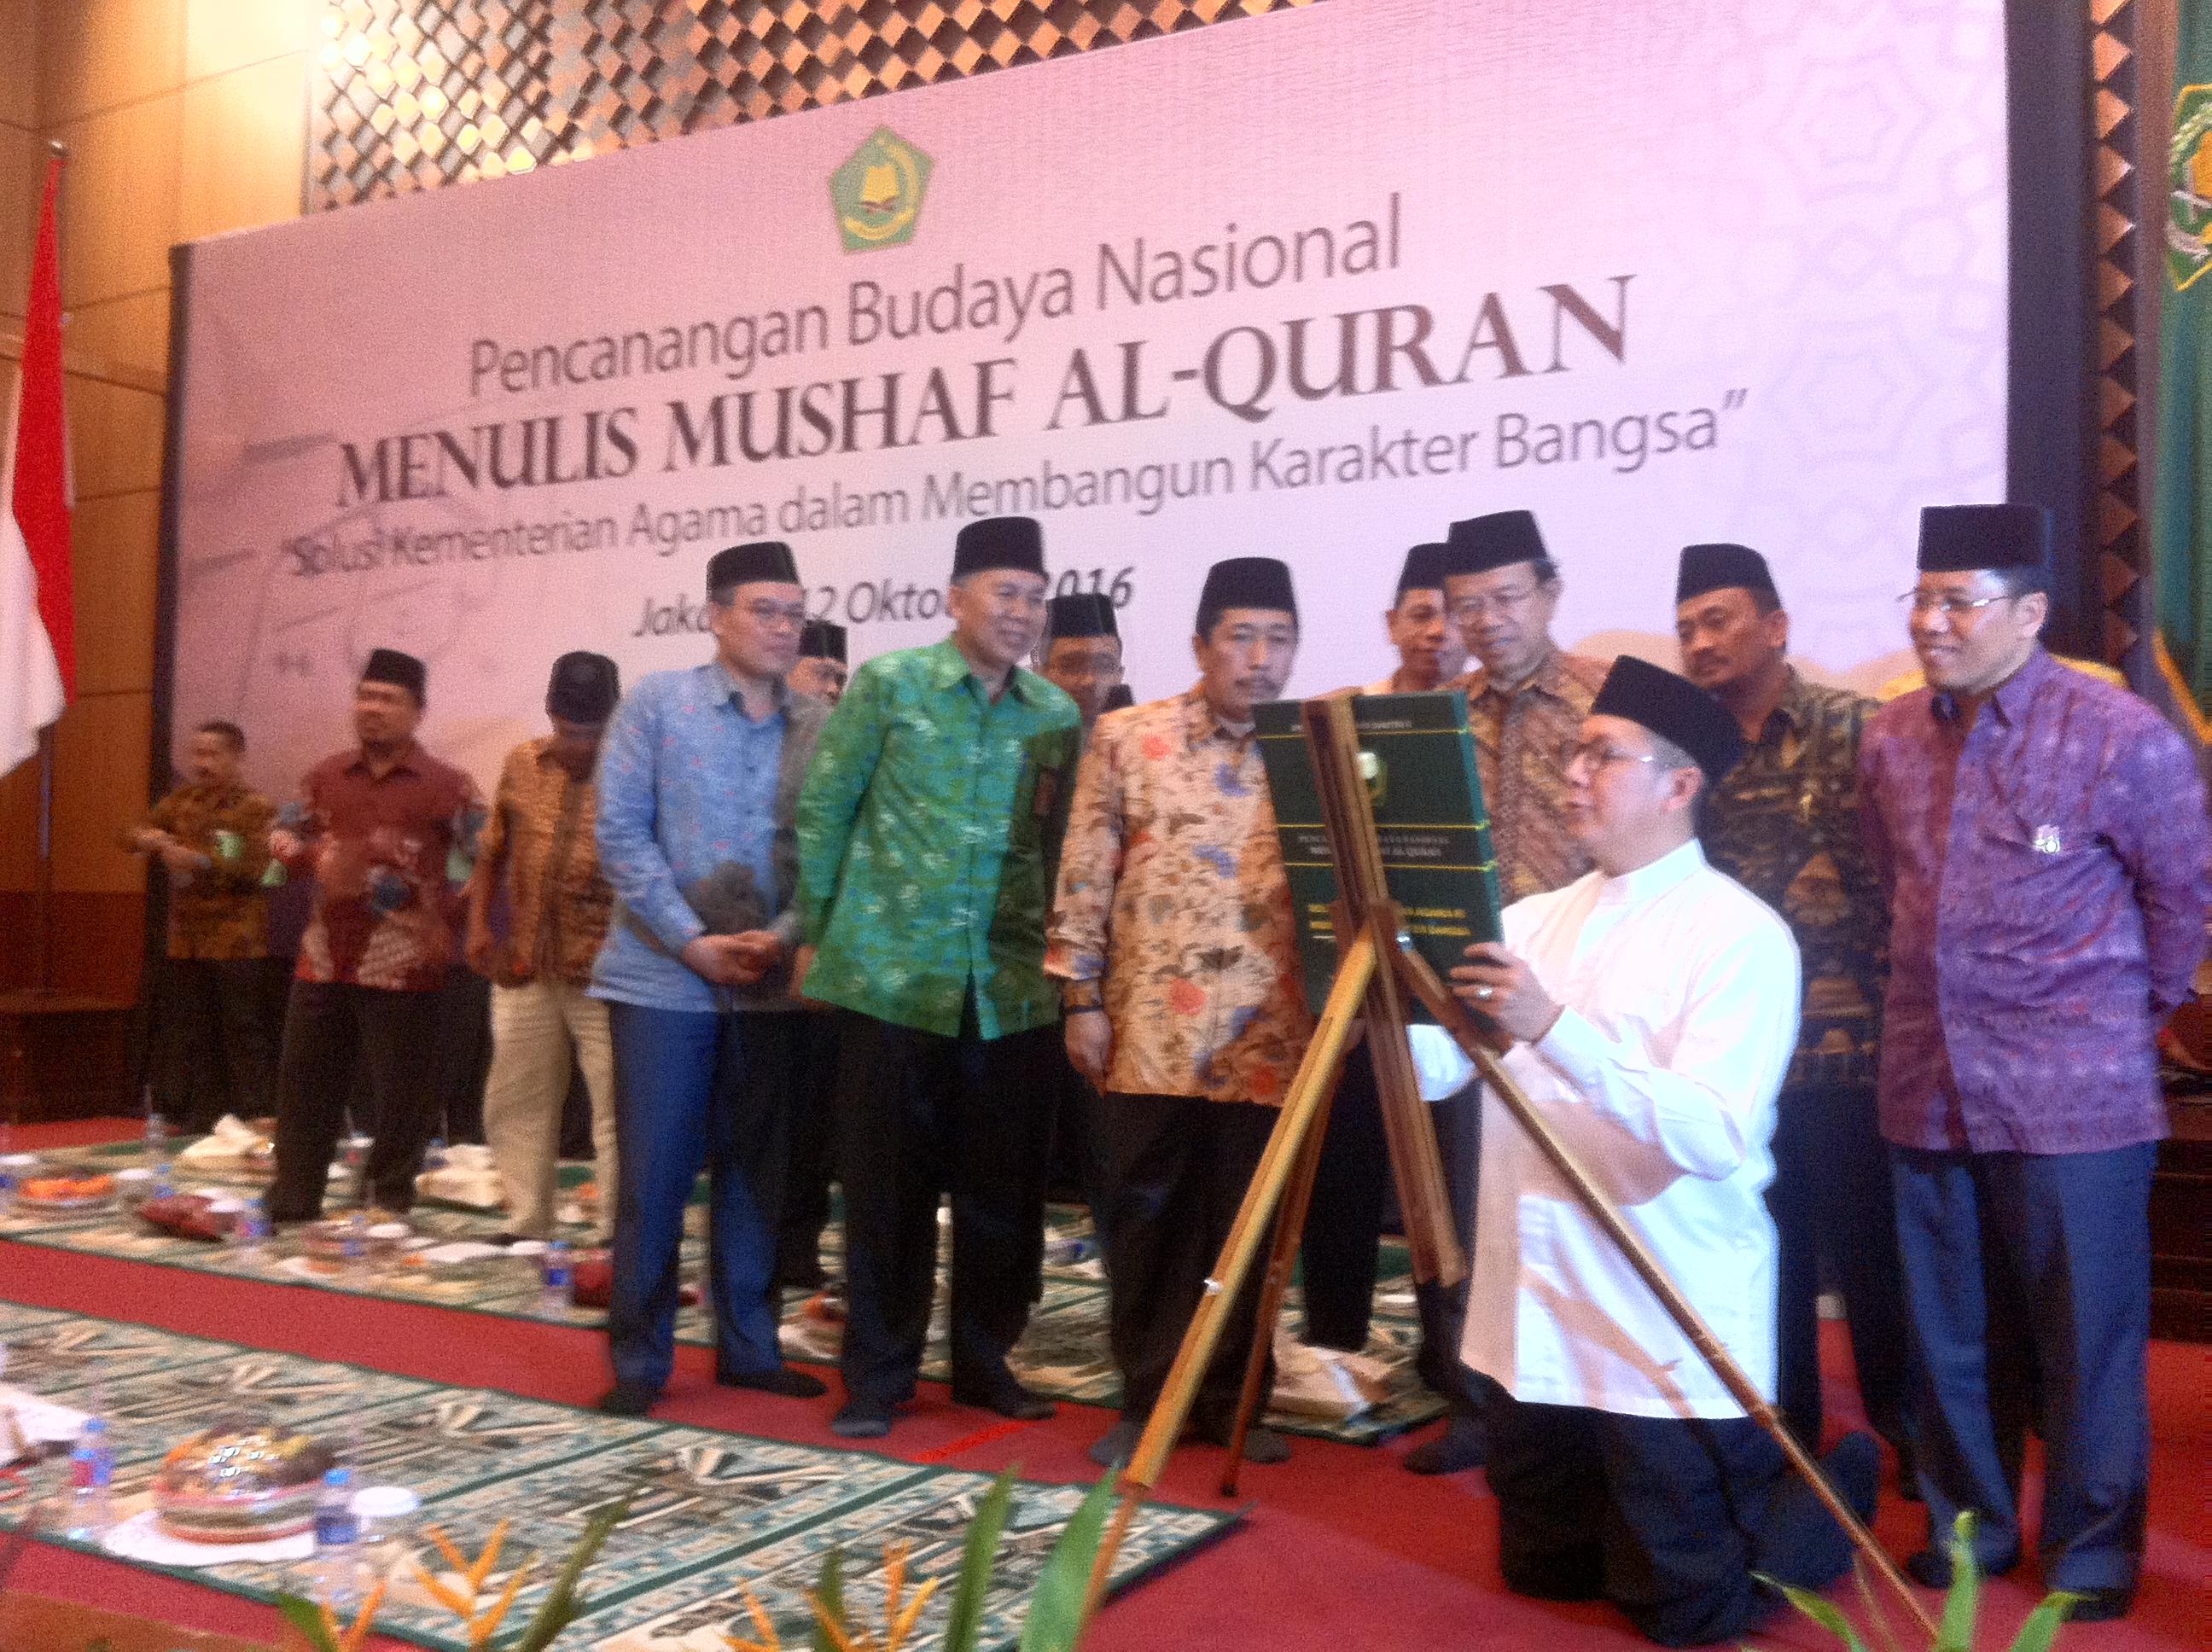 Presiden Jokowi Akan Terima Mushaf Santri